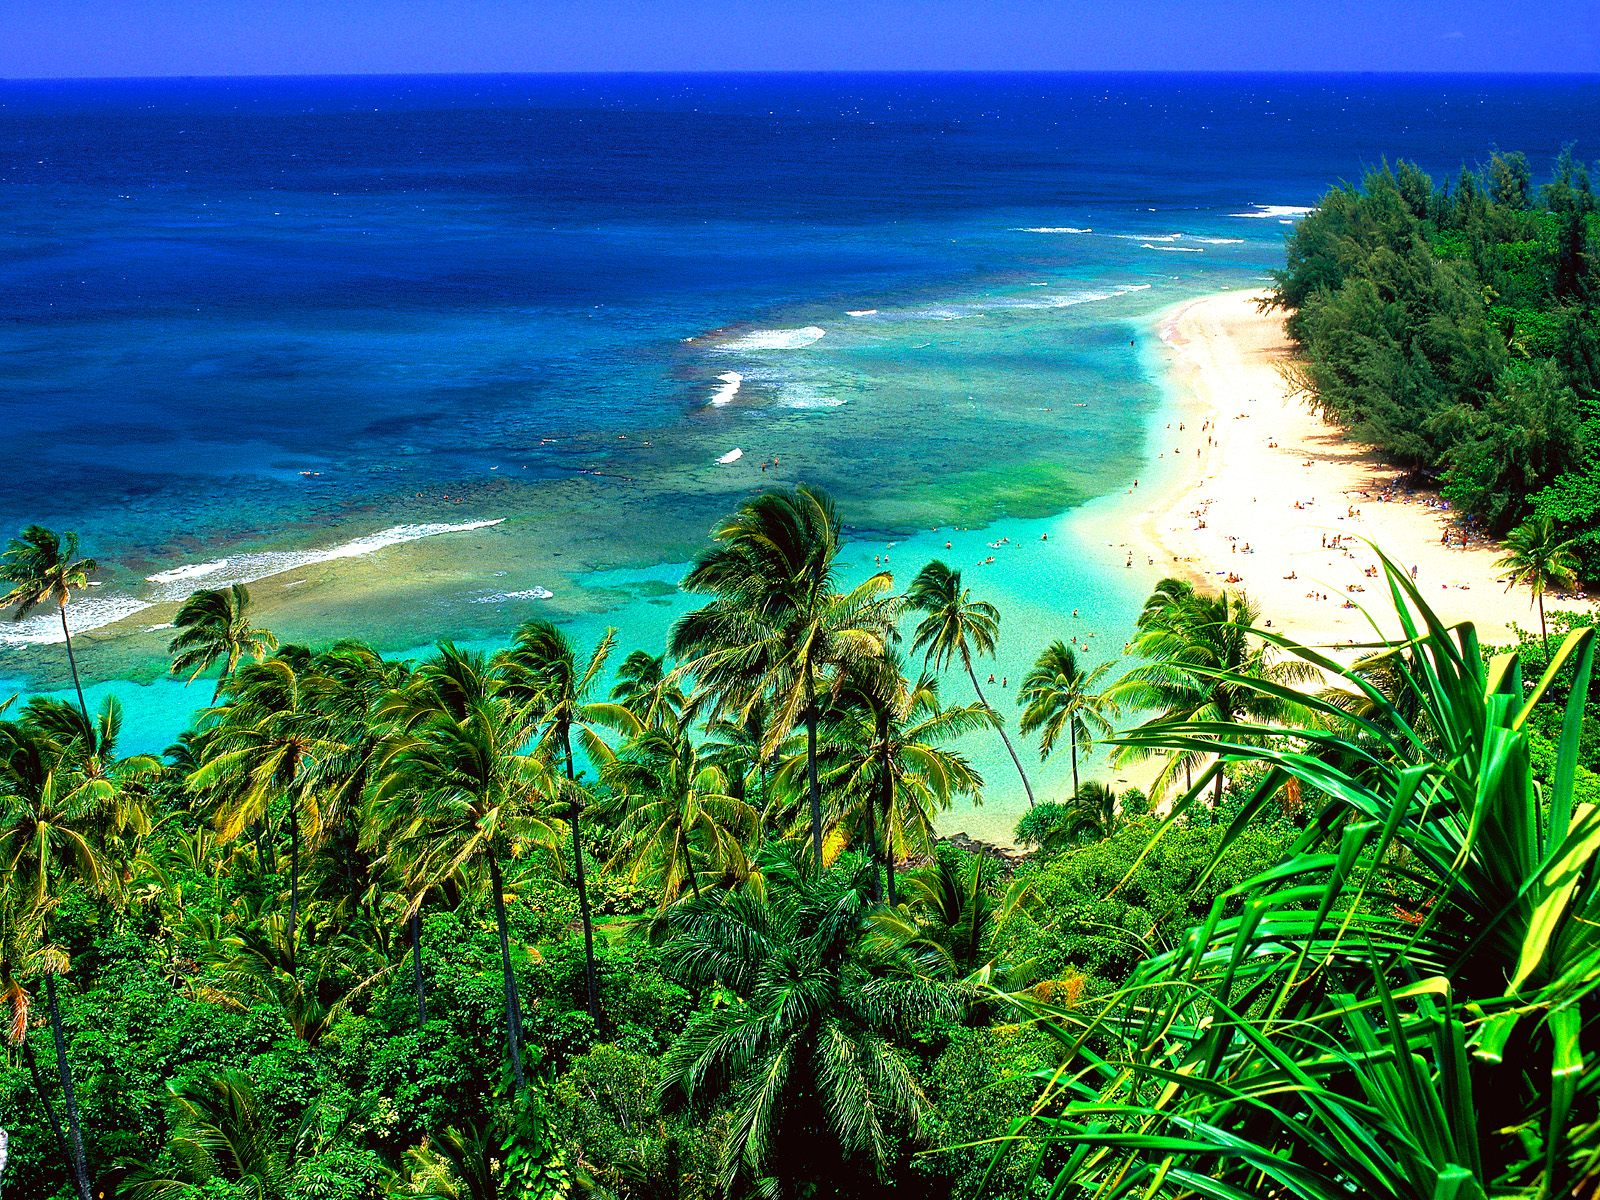 Reel in the natural beauty of Kauai Island in Hawaii an experienced 1600x1200